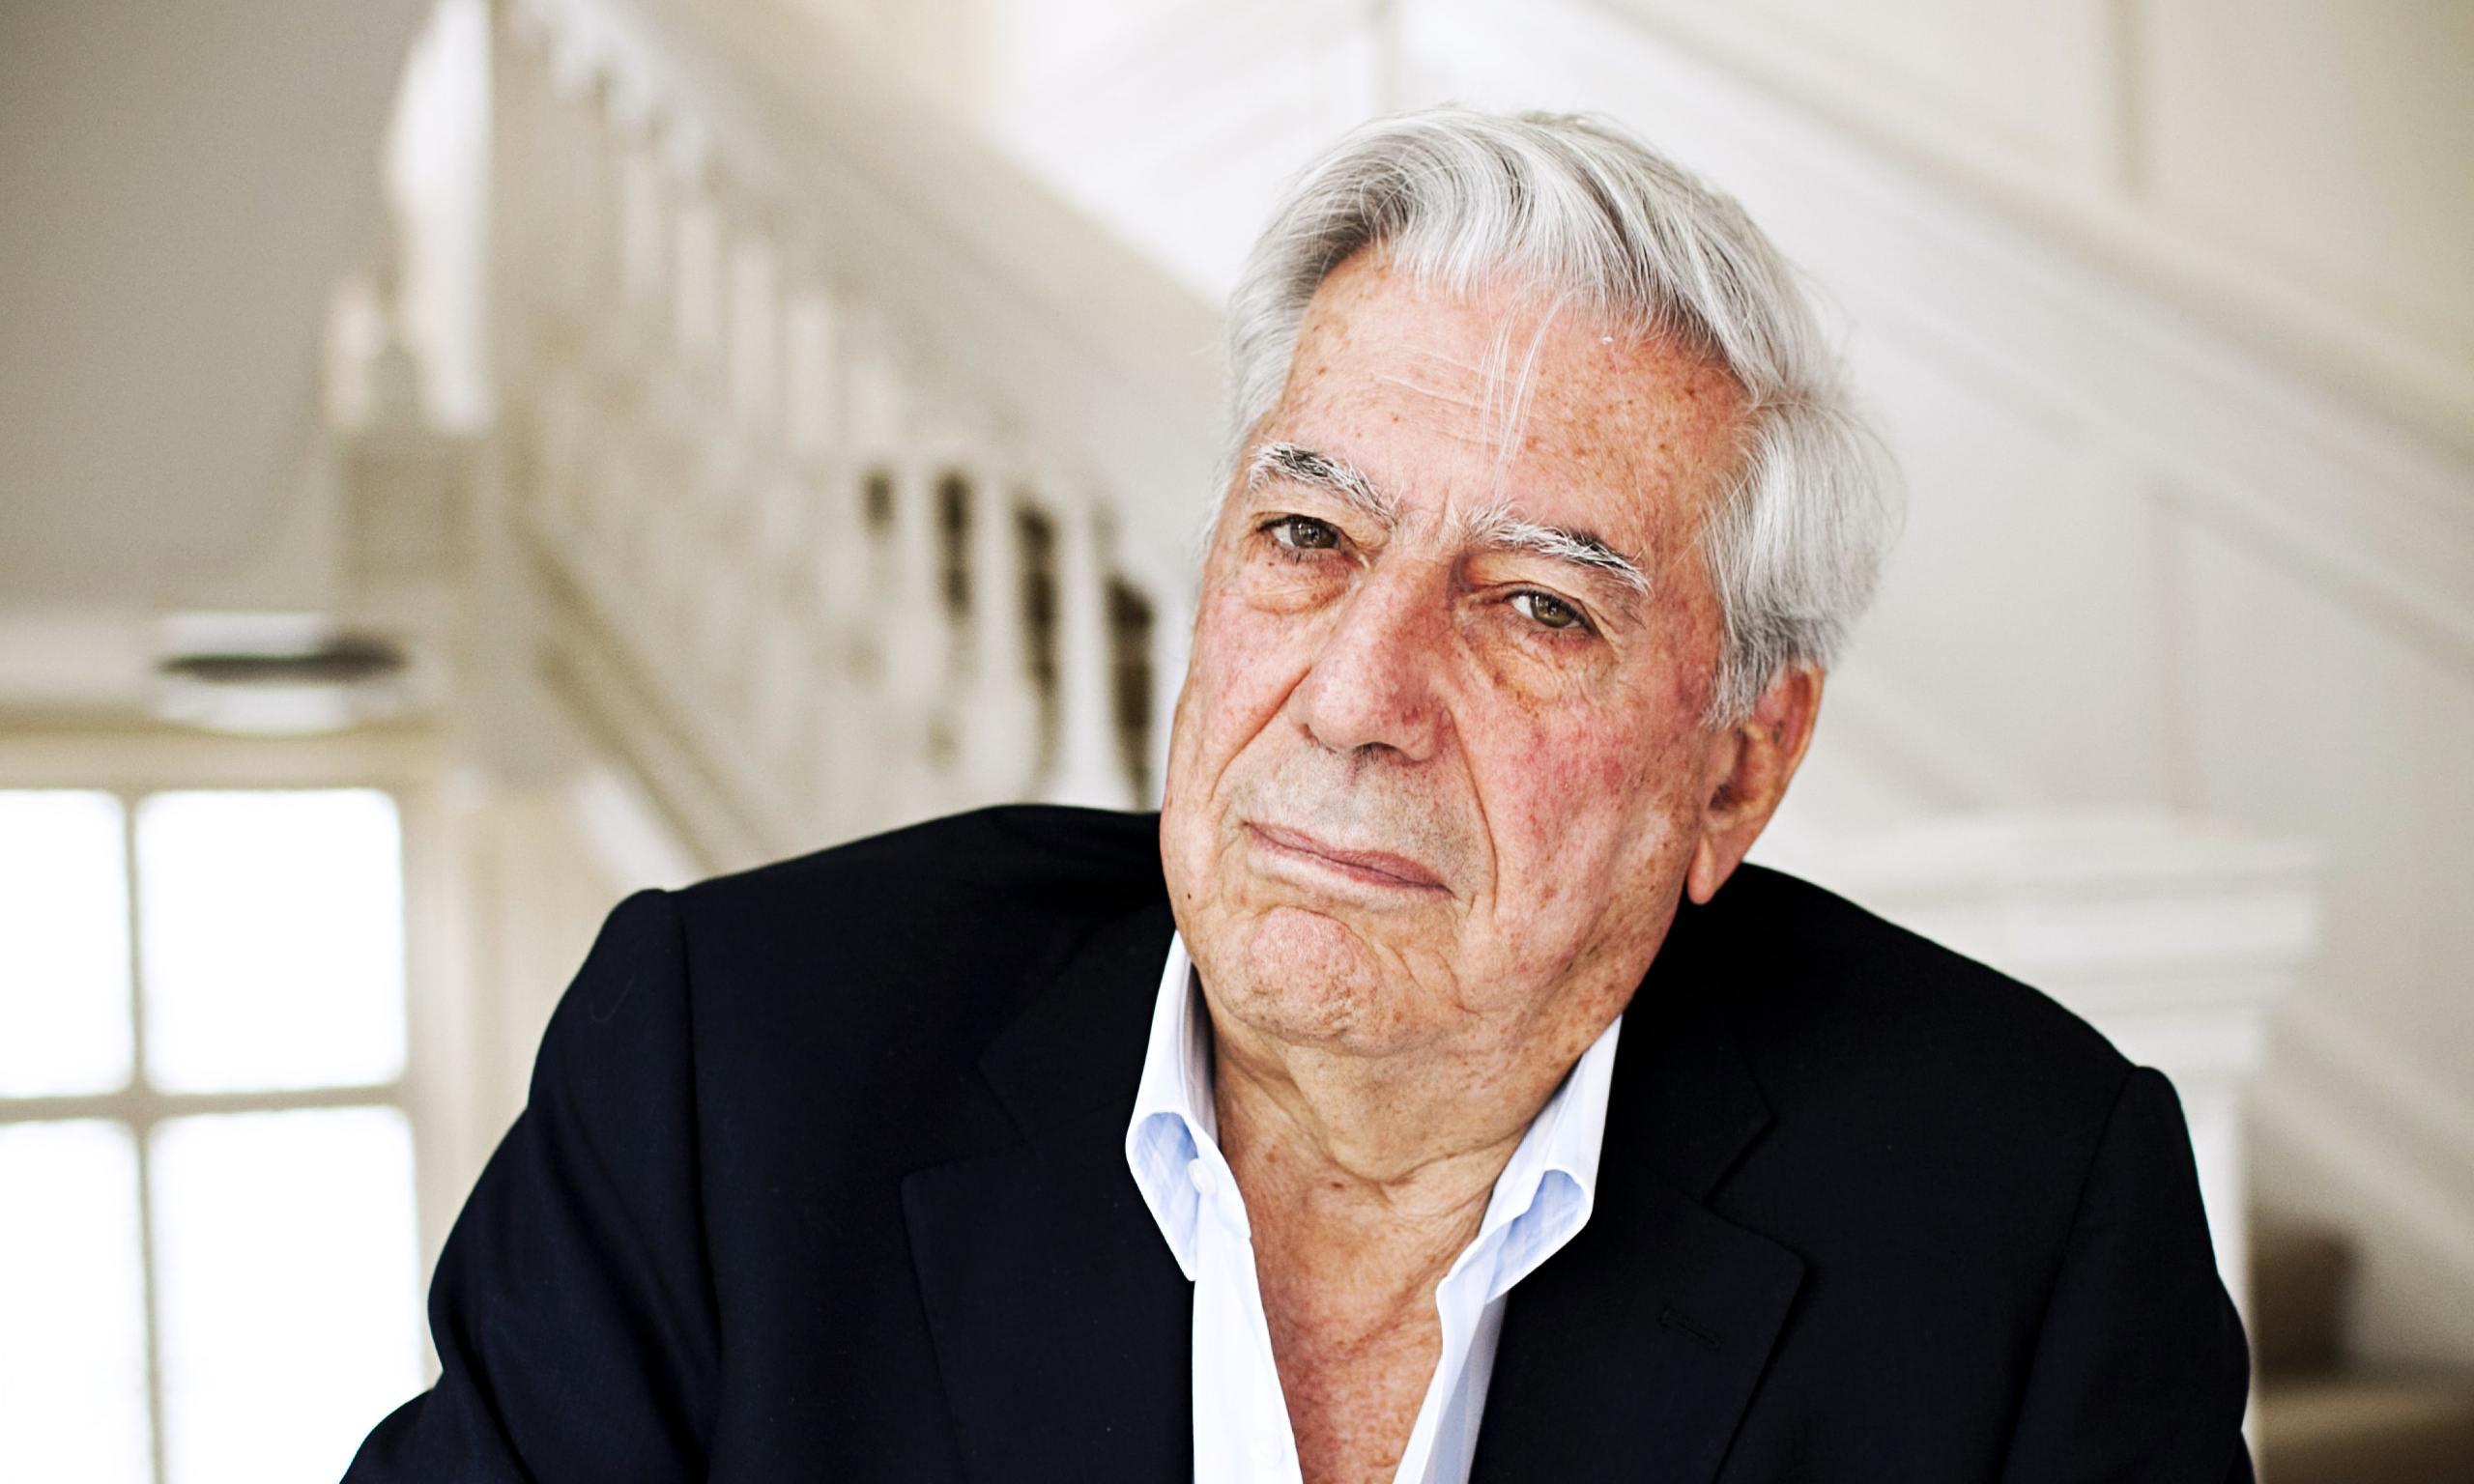 Venezuela Protest Crackdown Threatens Regions Democracy Warns Vargas Llosa World News The